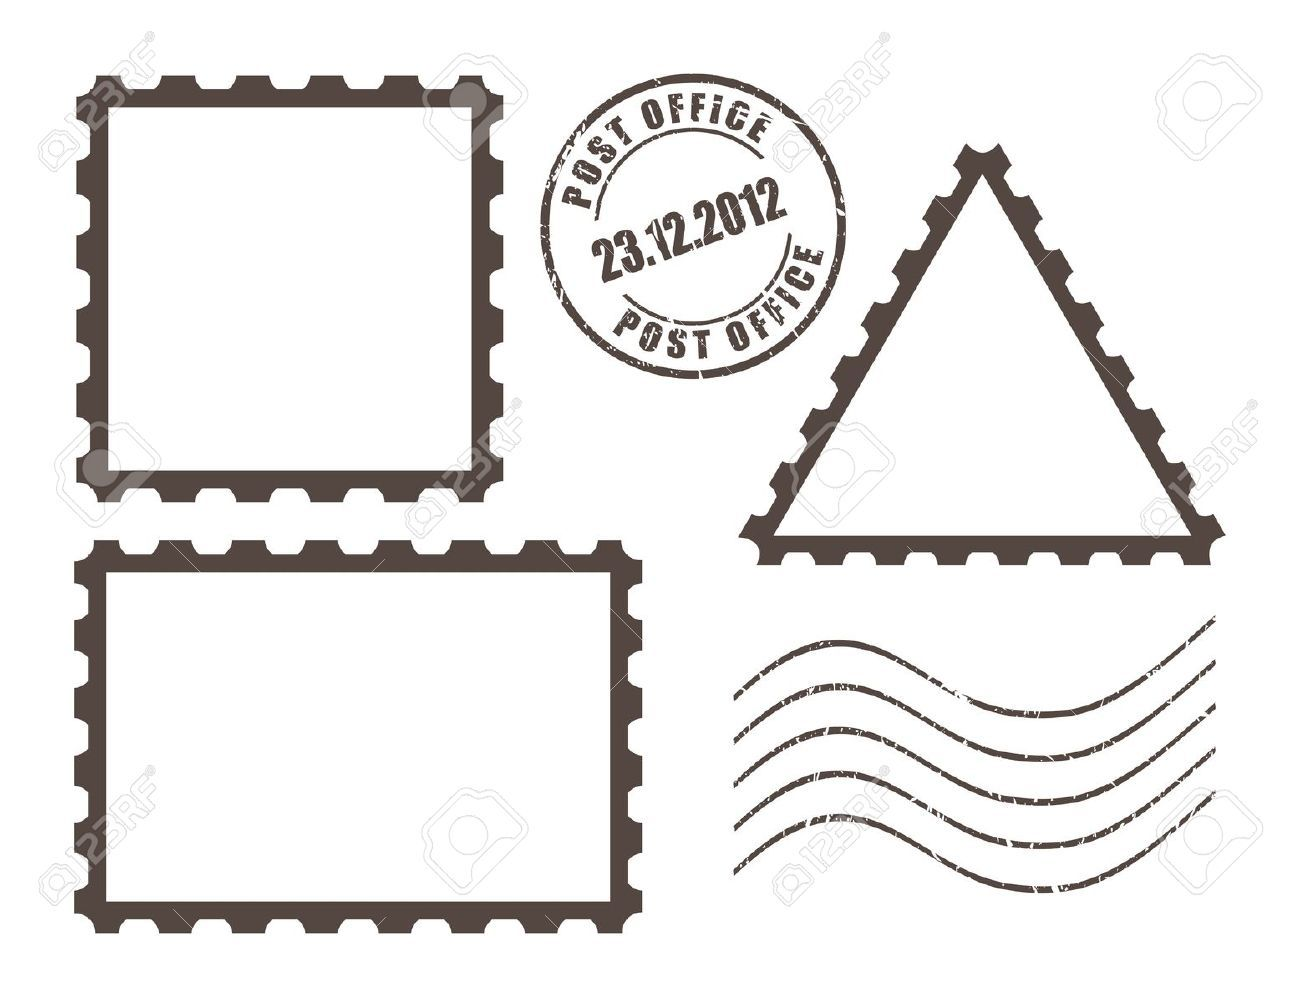 Postage stamp & mark.